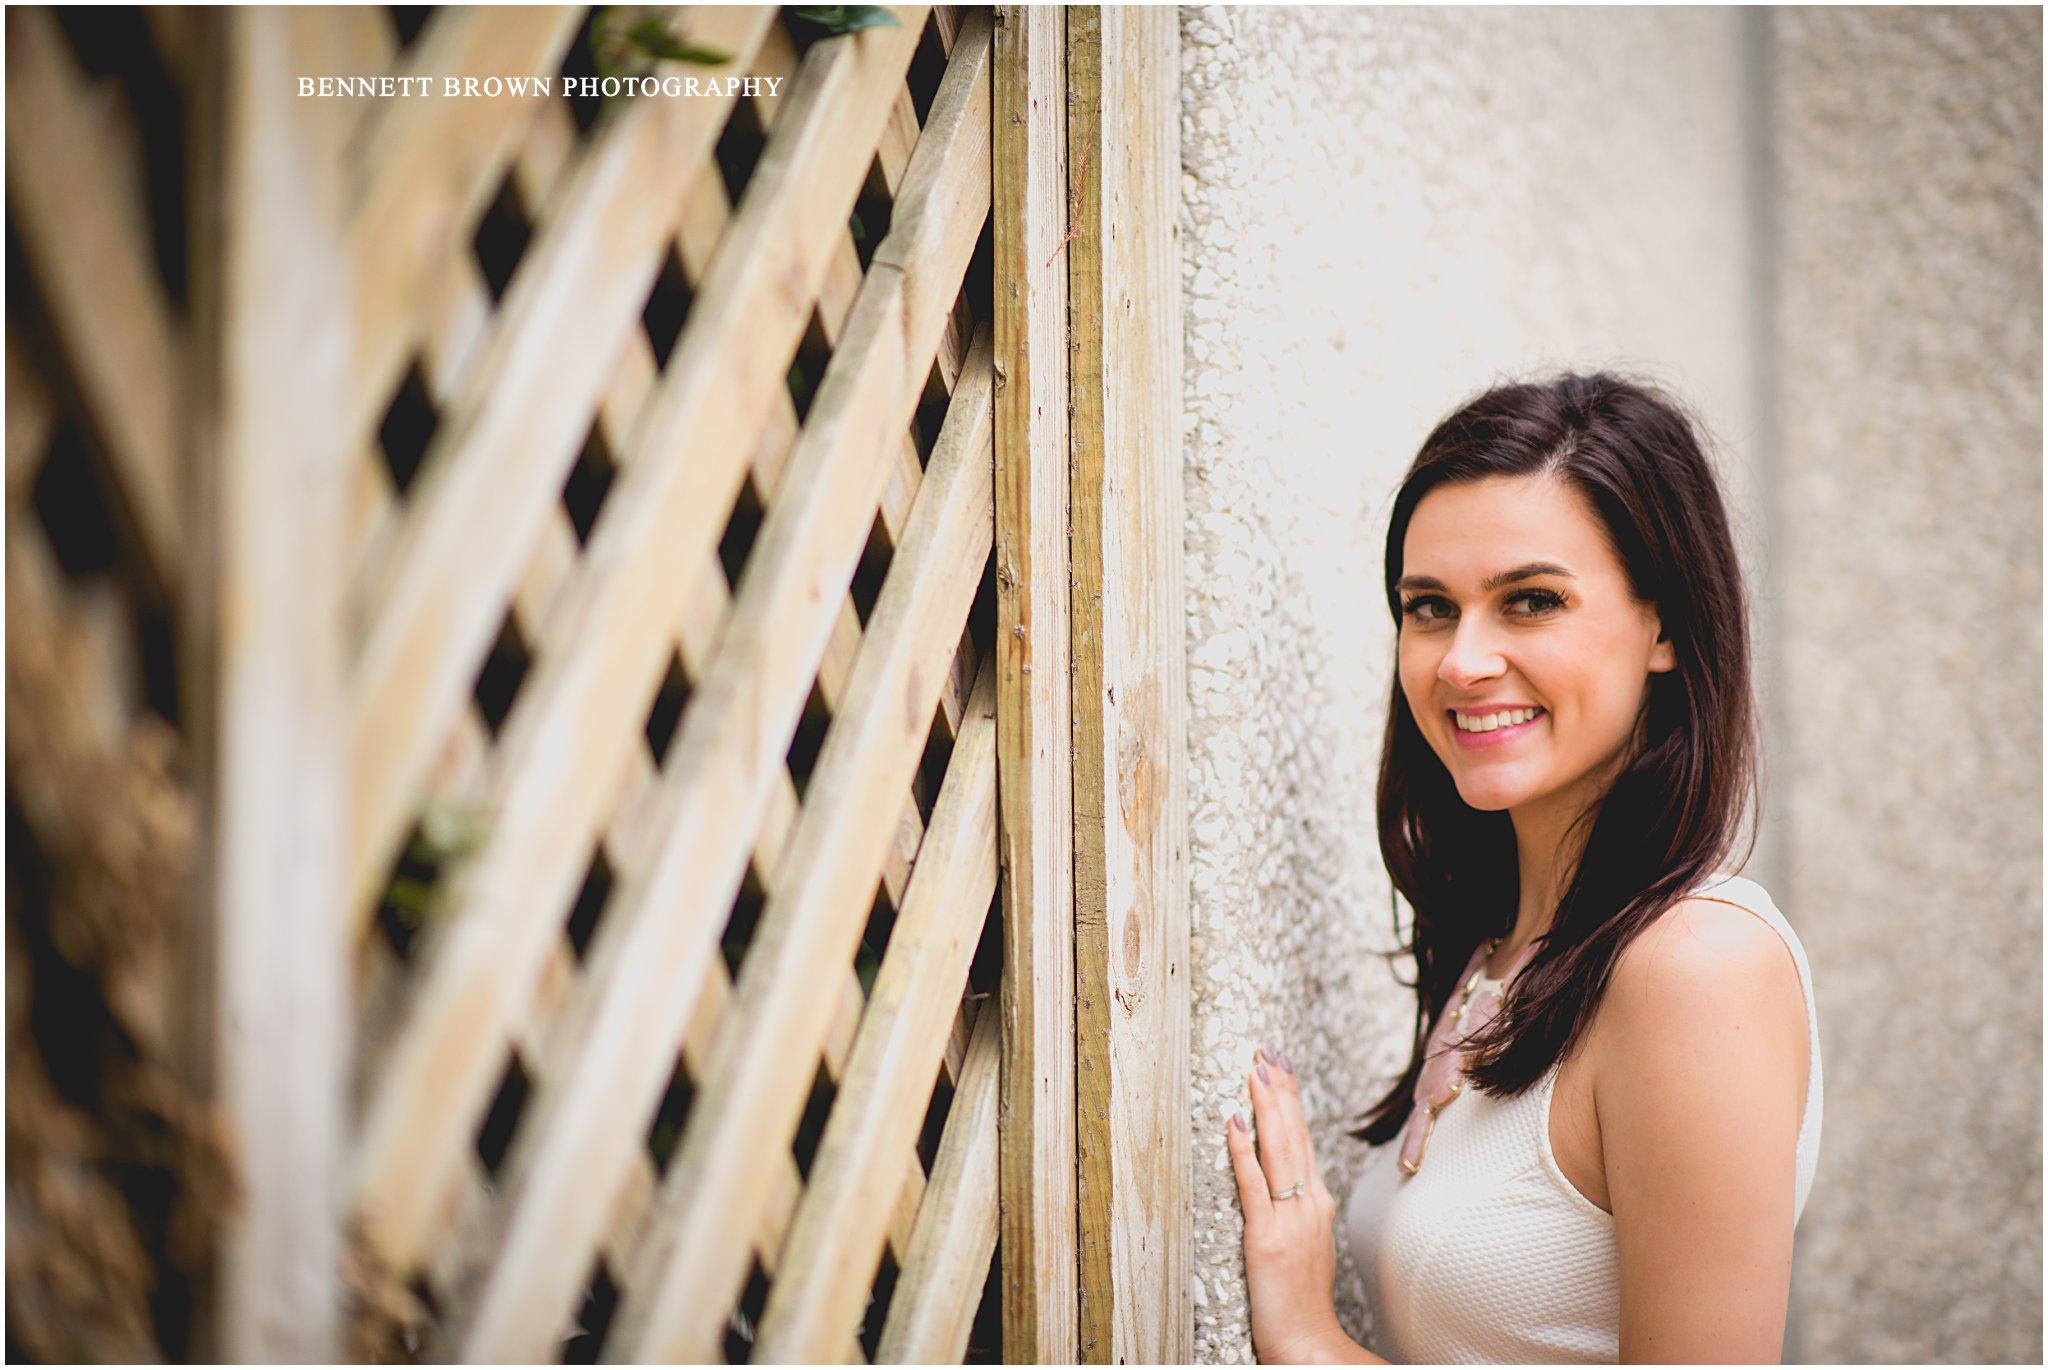 Bennett Brown Photography bride ivy engagement